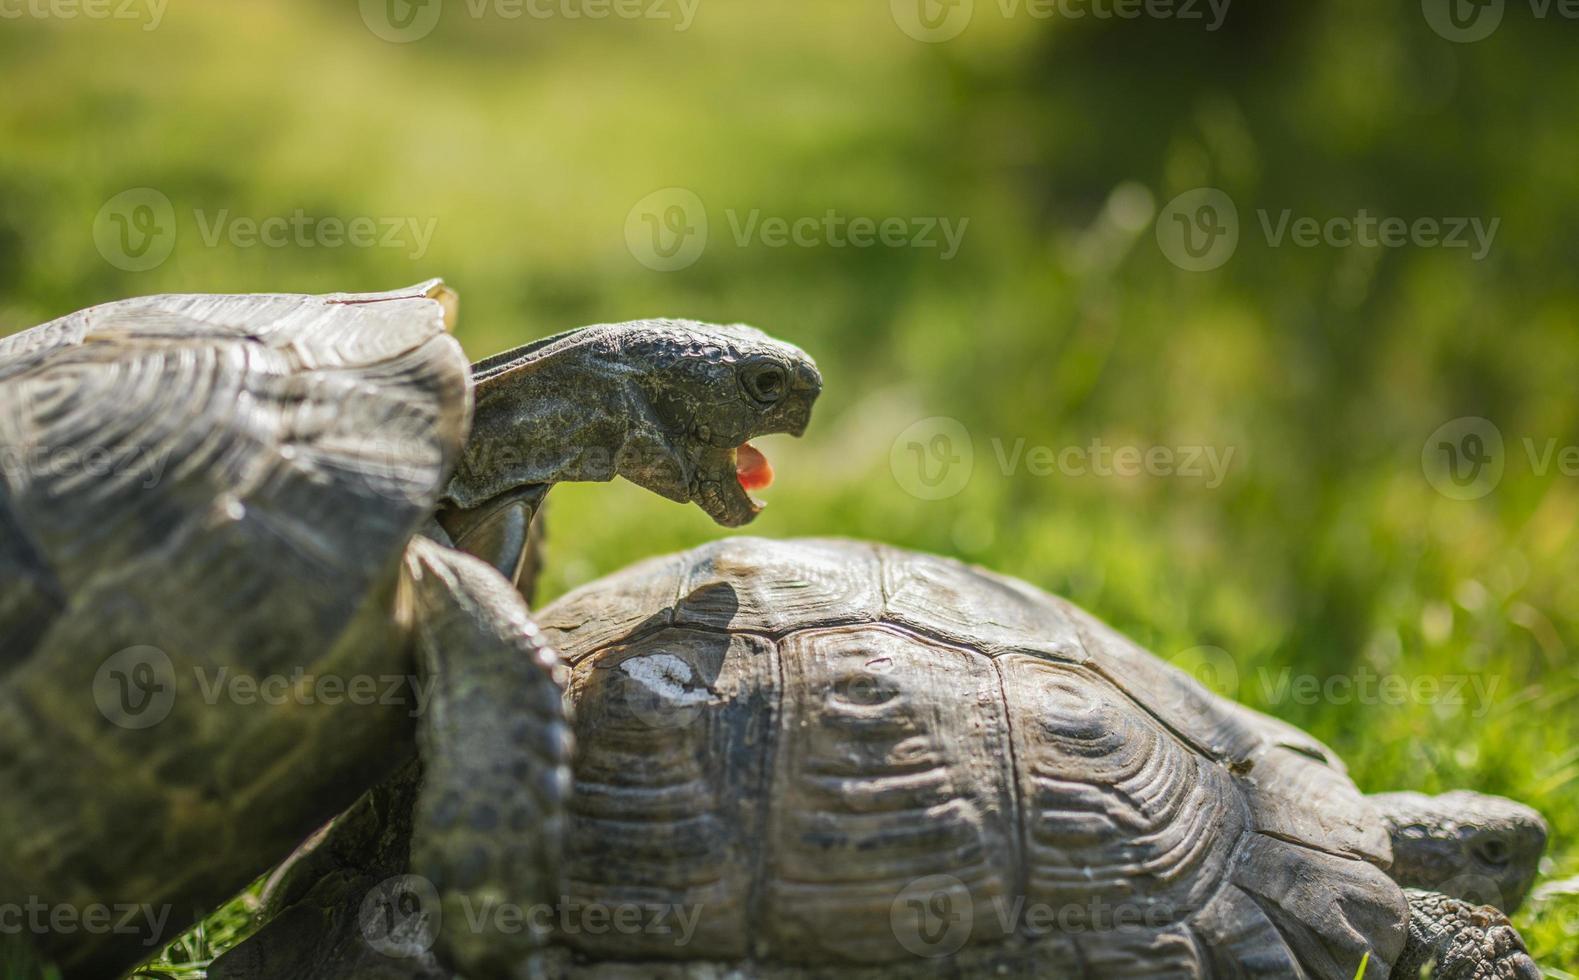 pequena tartaruga bonitinha no garss verde foto